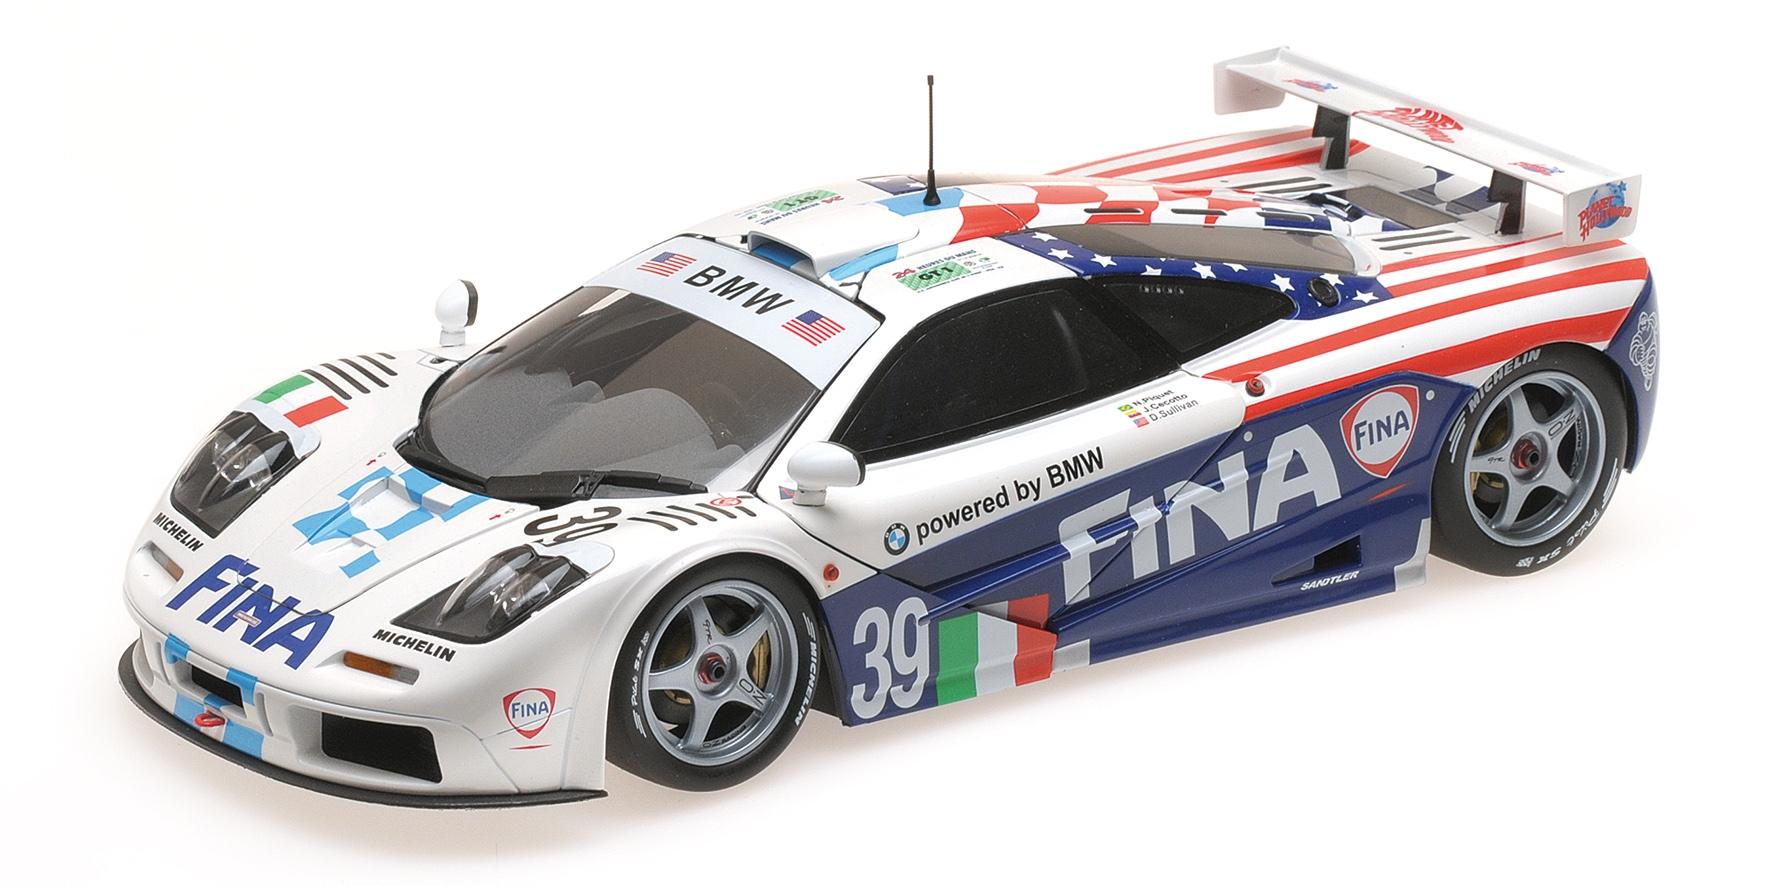 McLAREN F1 GTR FINA TEAM BIGAZZI CECOTTO PIQUET 24H LE MANS 1996 Minichamps Mini